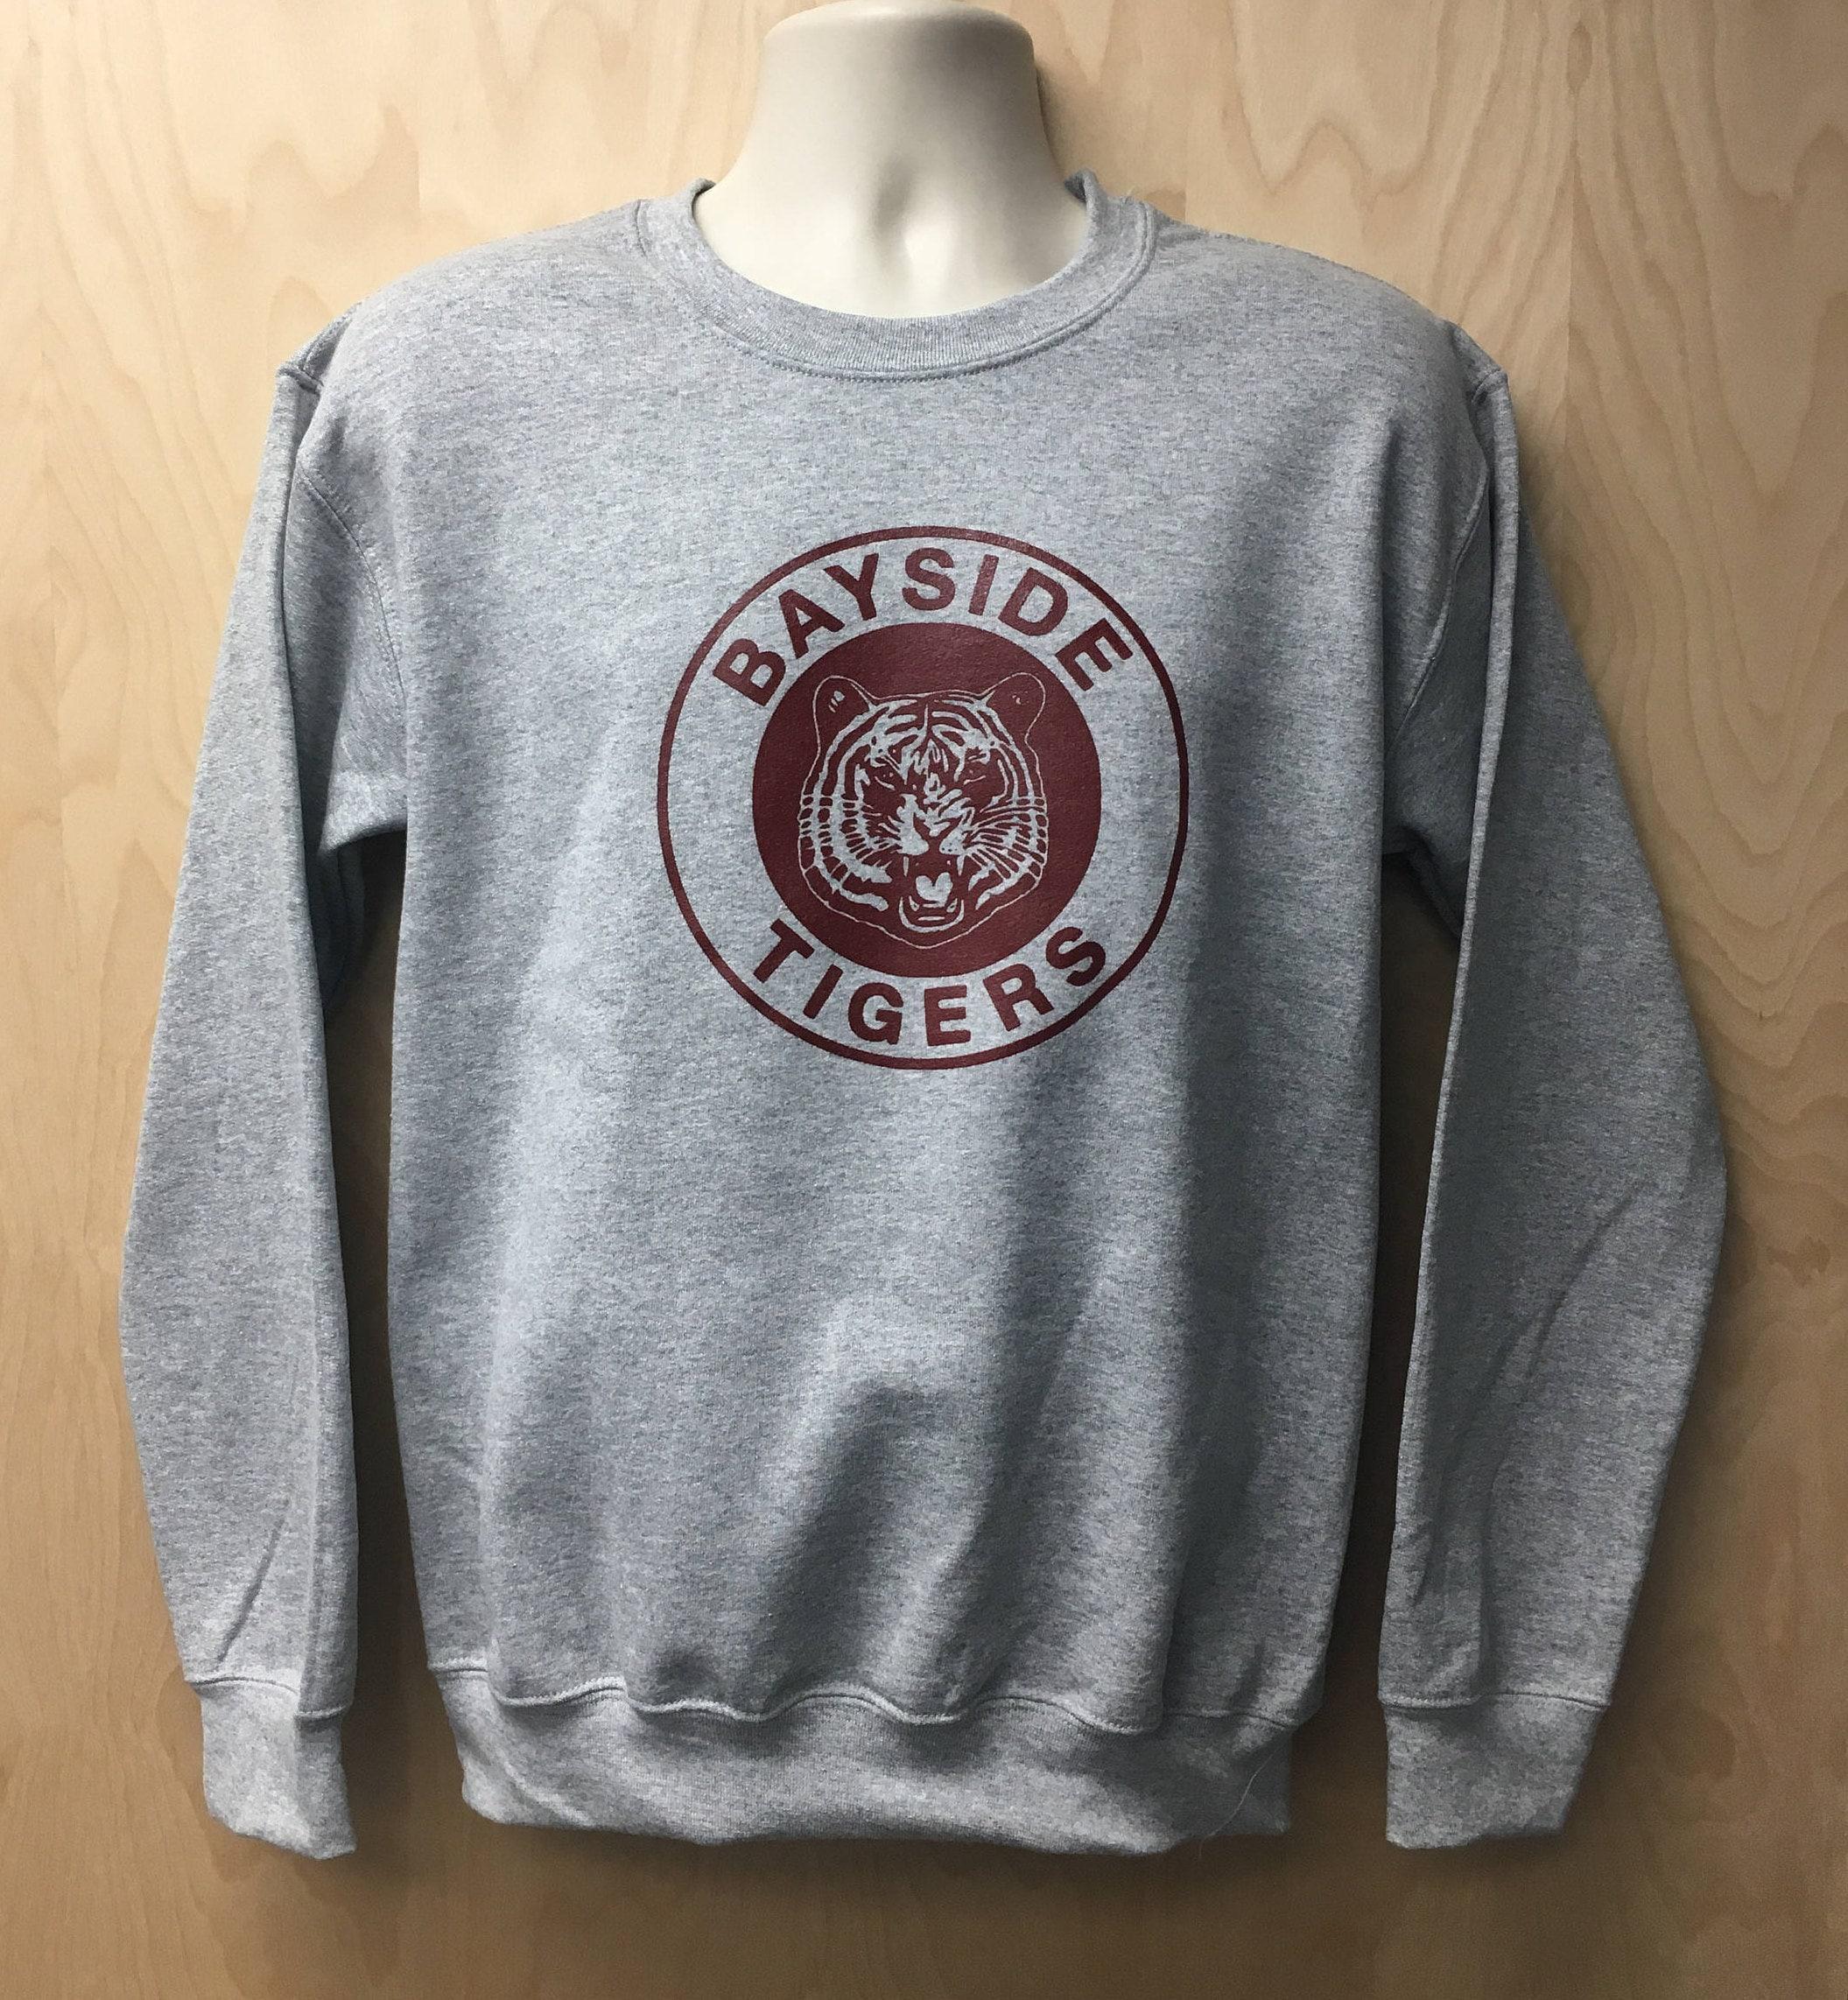 Bayside Tigers Logo Sweatshirt TV Show Zack Morris AC Slater | Etsy